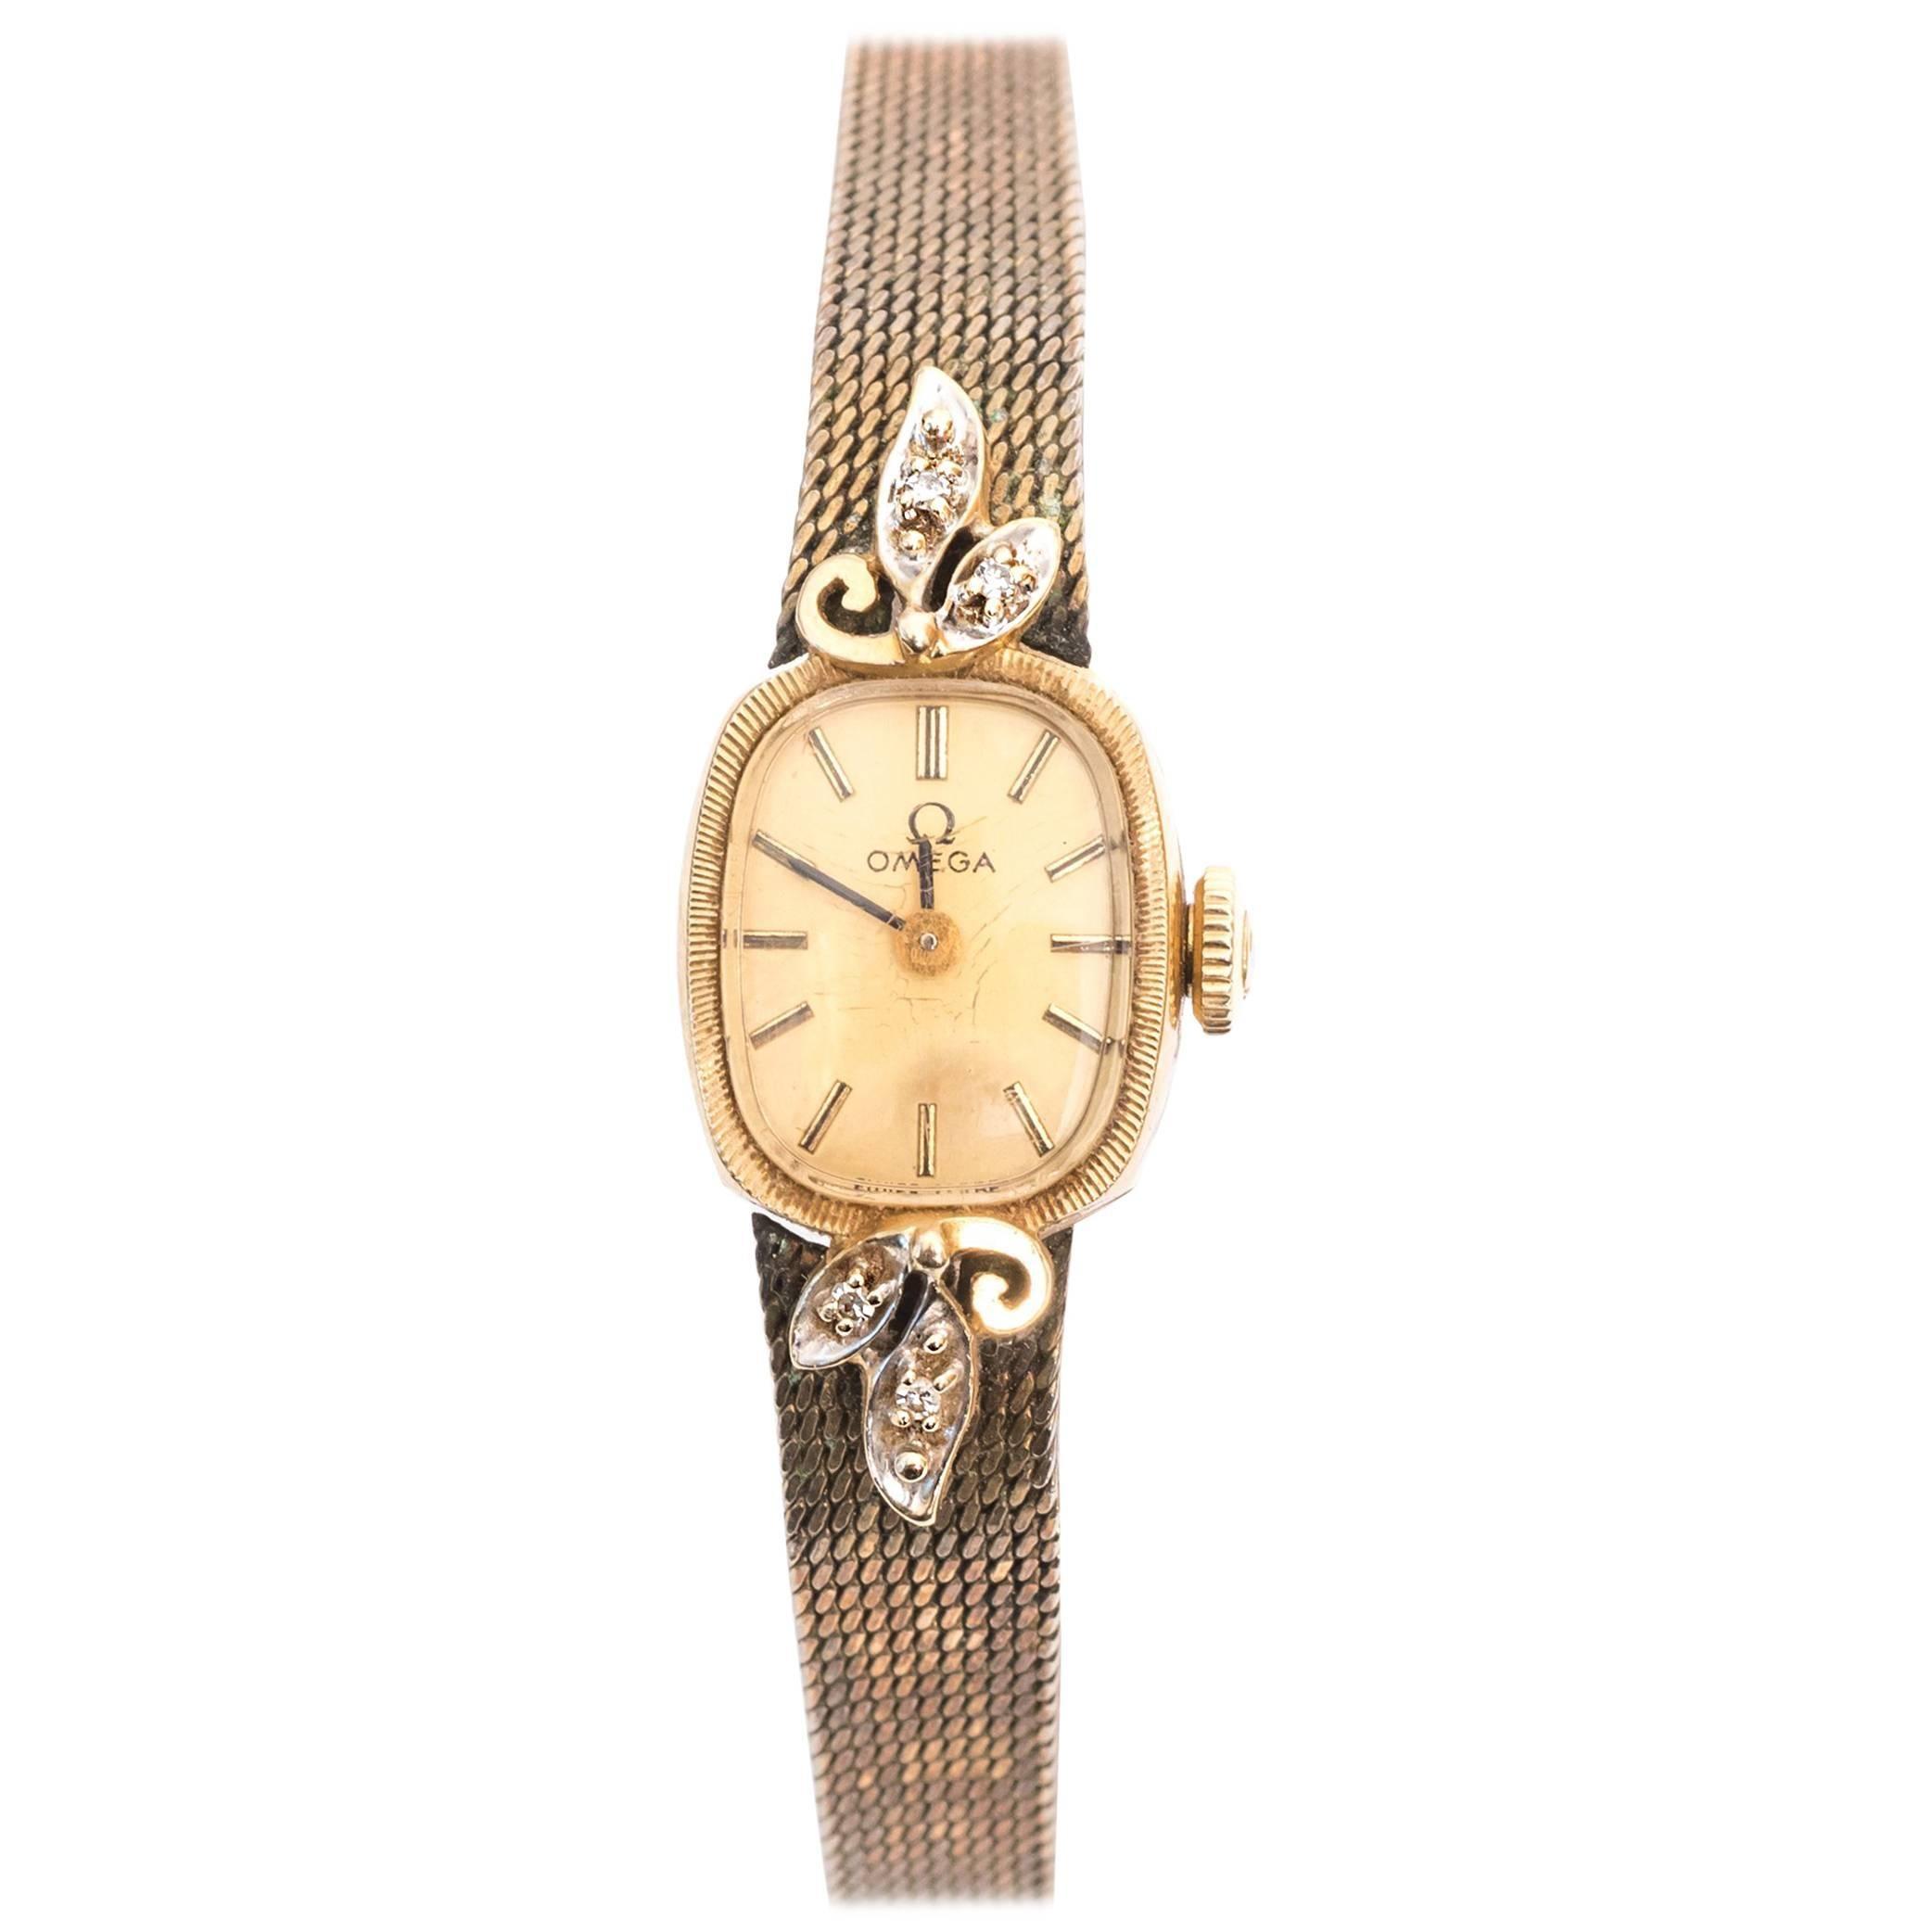 Omega Ladies Yellow Gold Diamonds Wristwatch circa 1970s